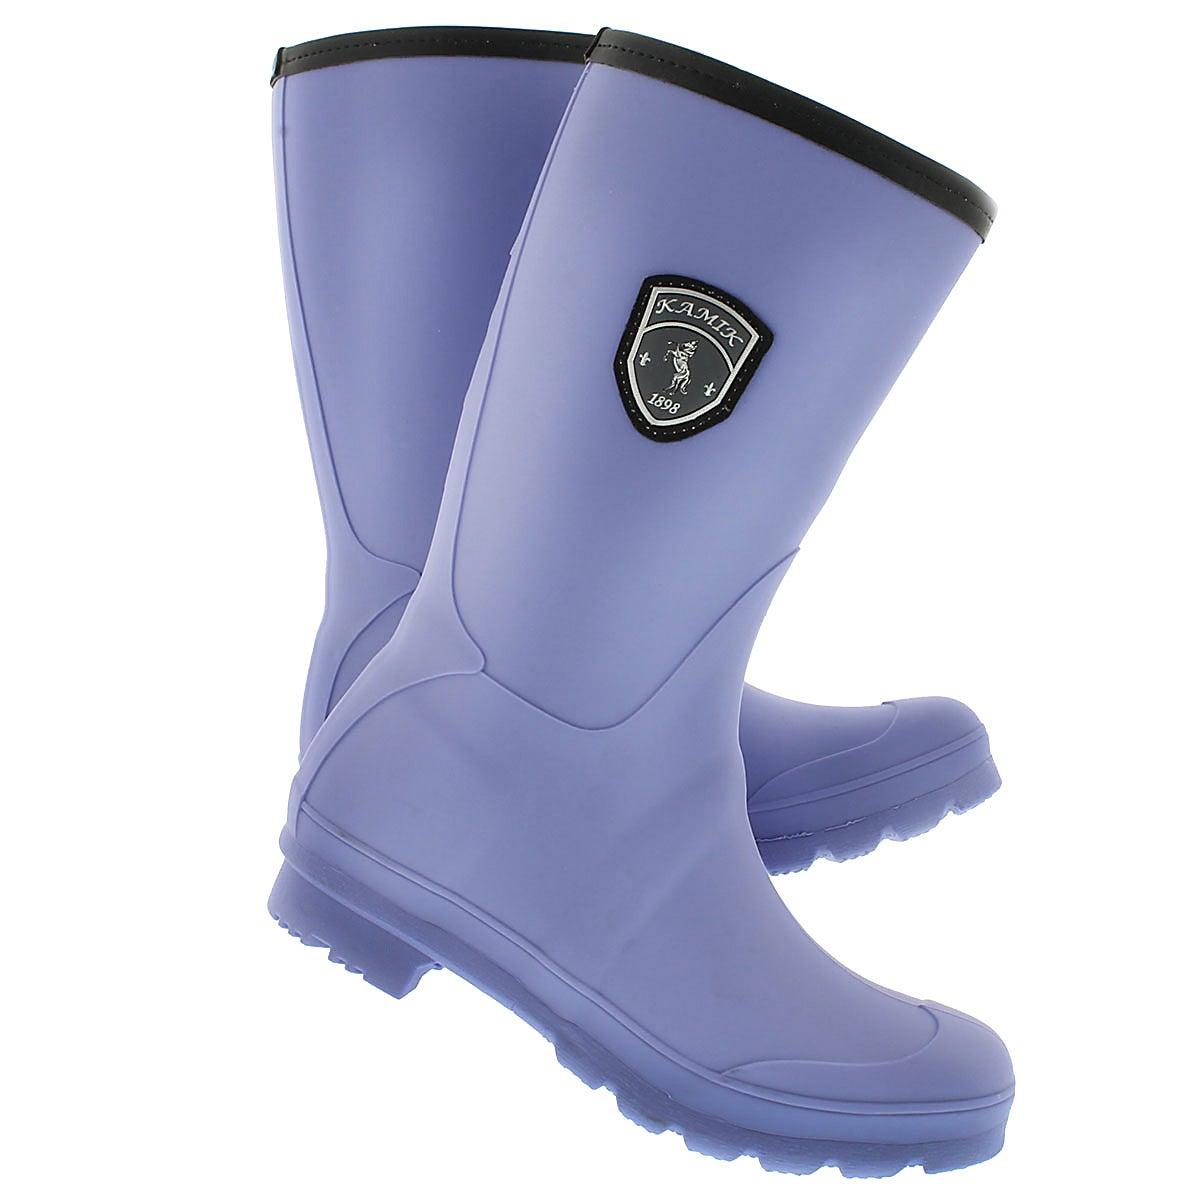 Lds Jenny periwinkle mid rain boot